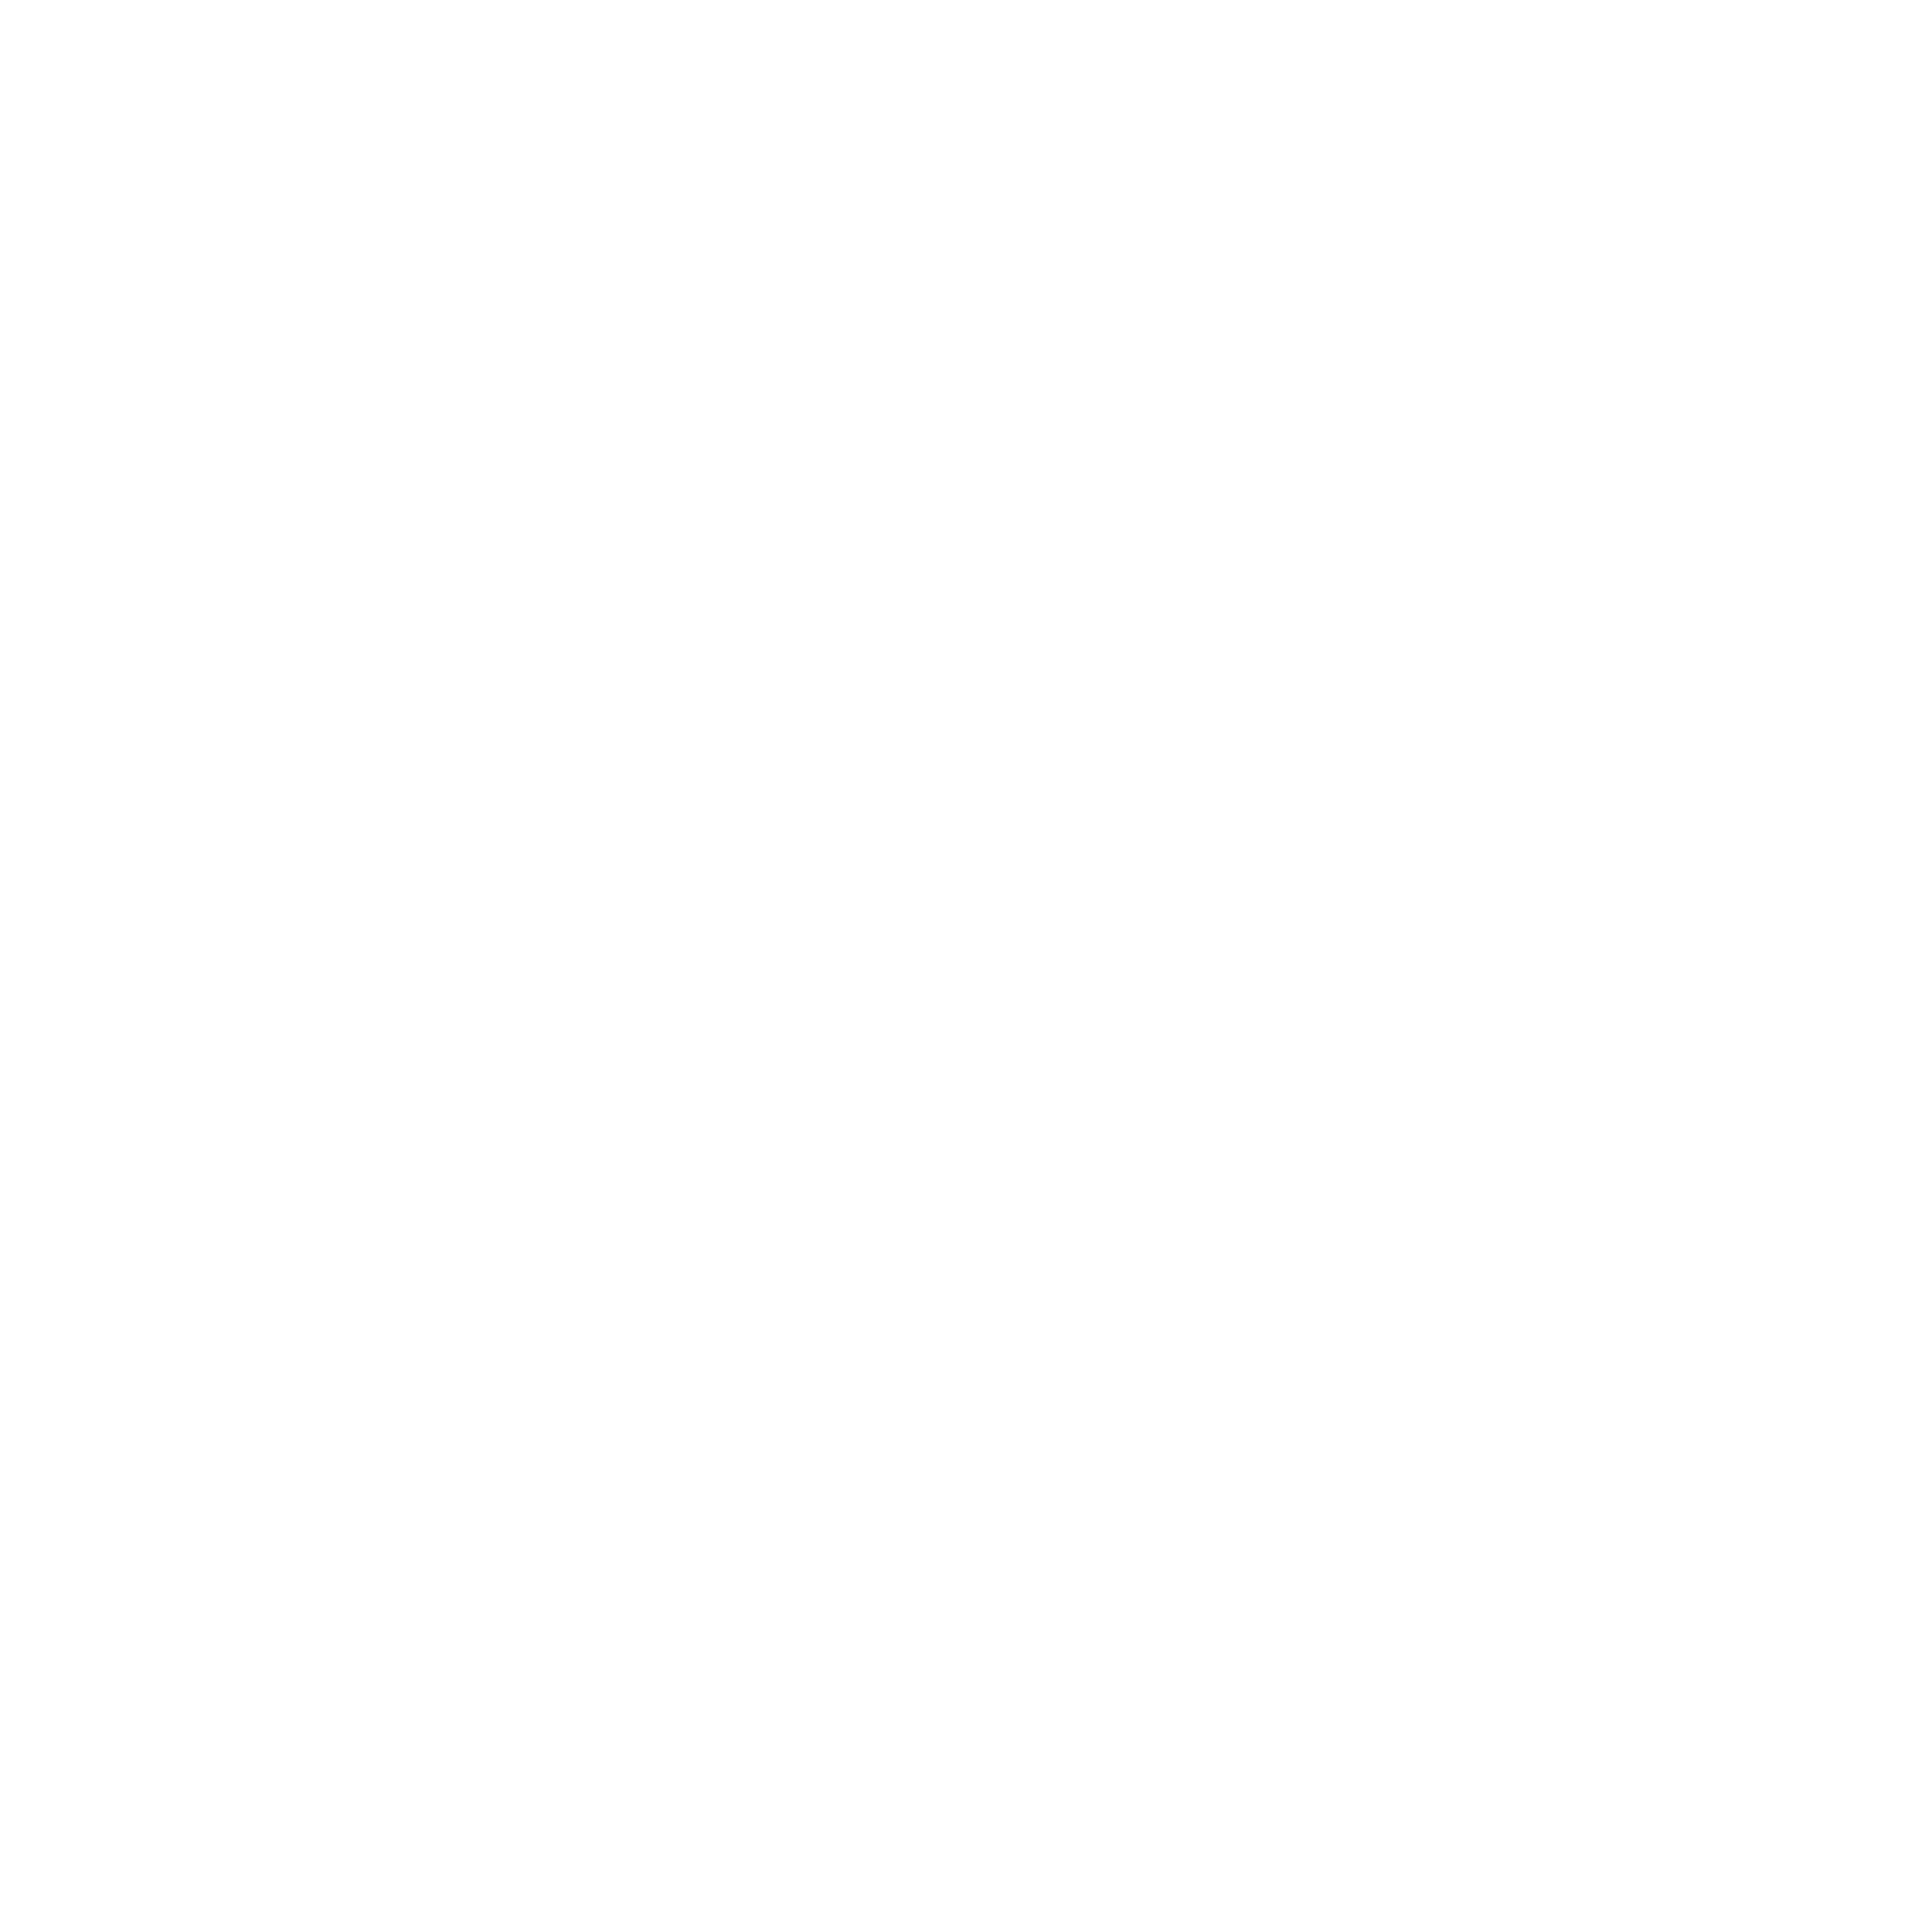 MB-pb.png